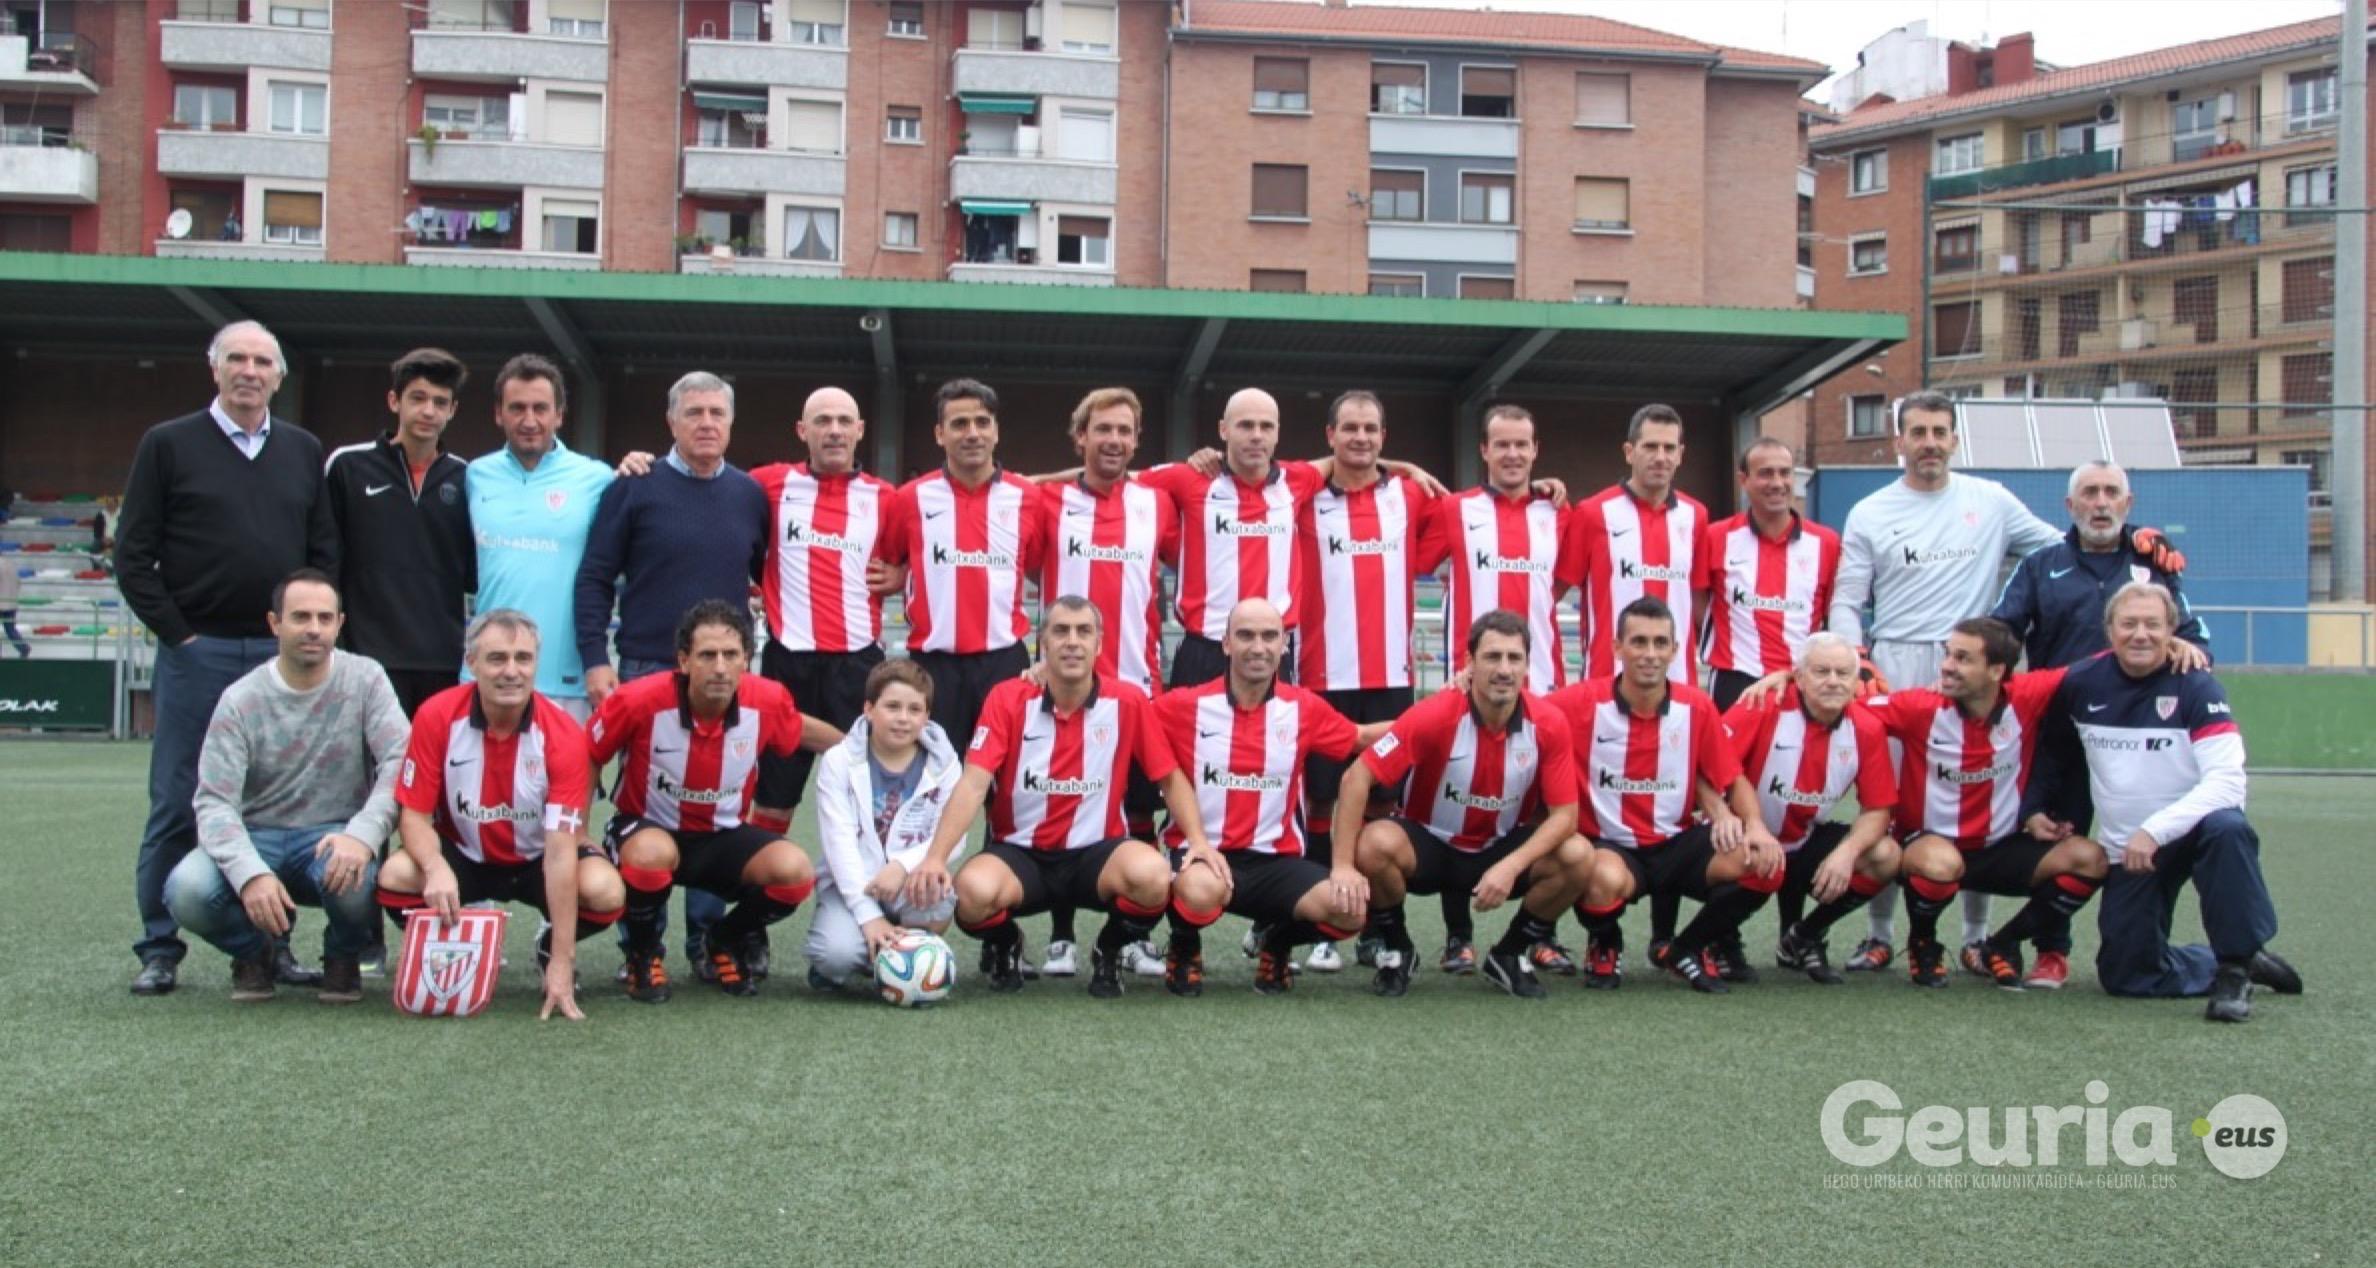 basauri_san_fausto_2015_futbol_basconia_beteranoak_1